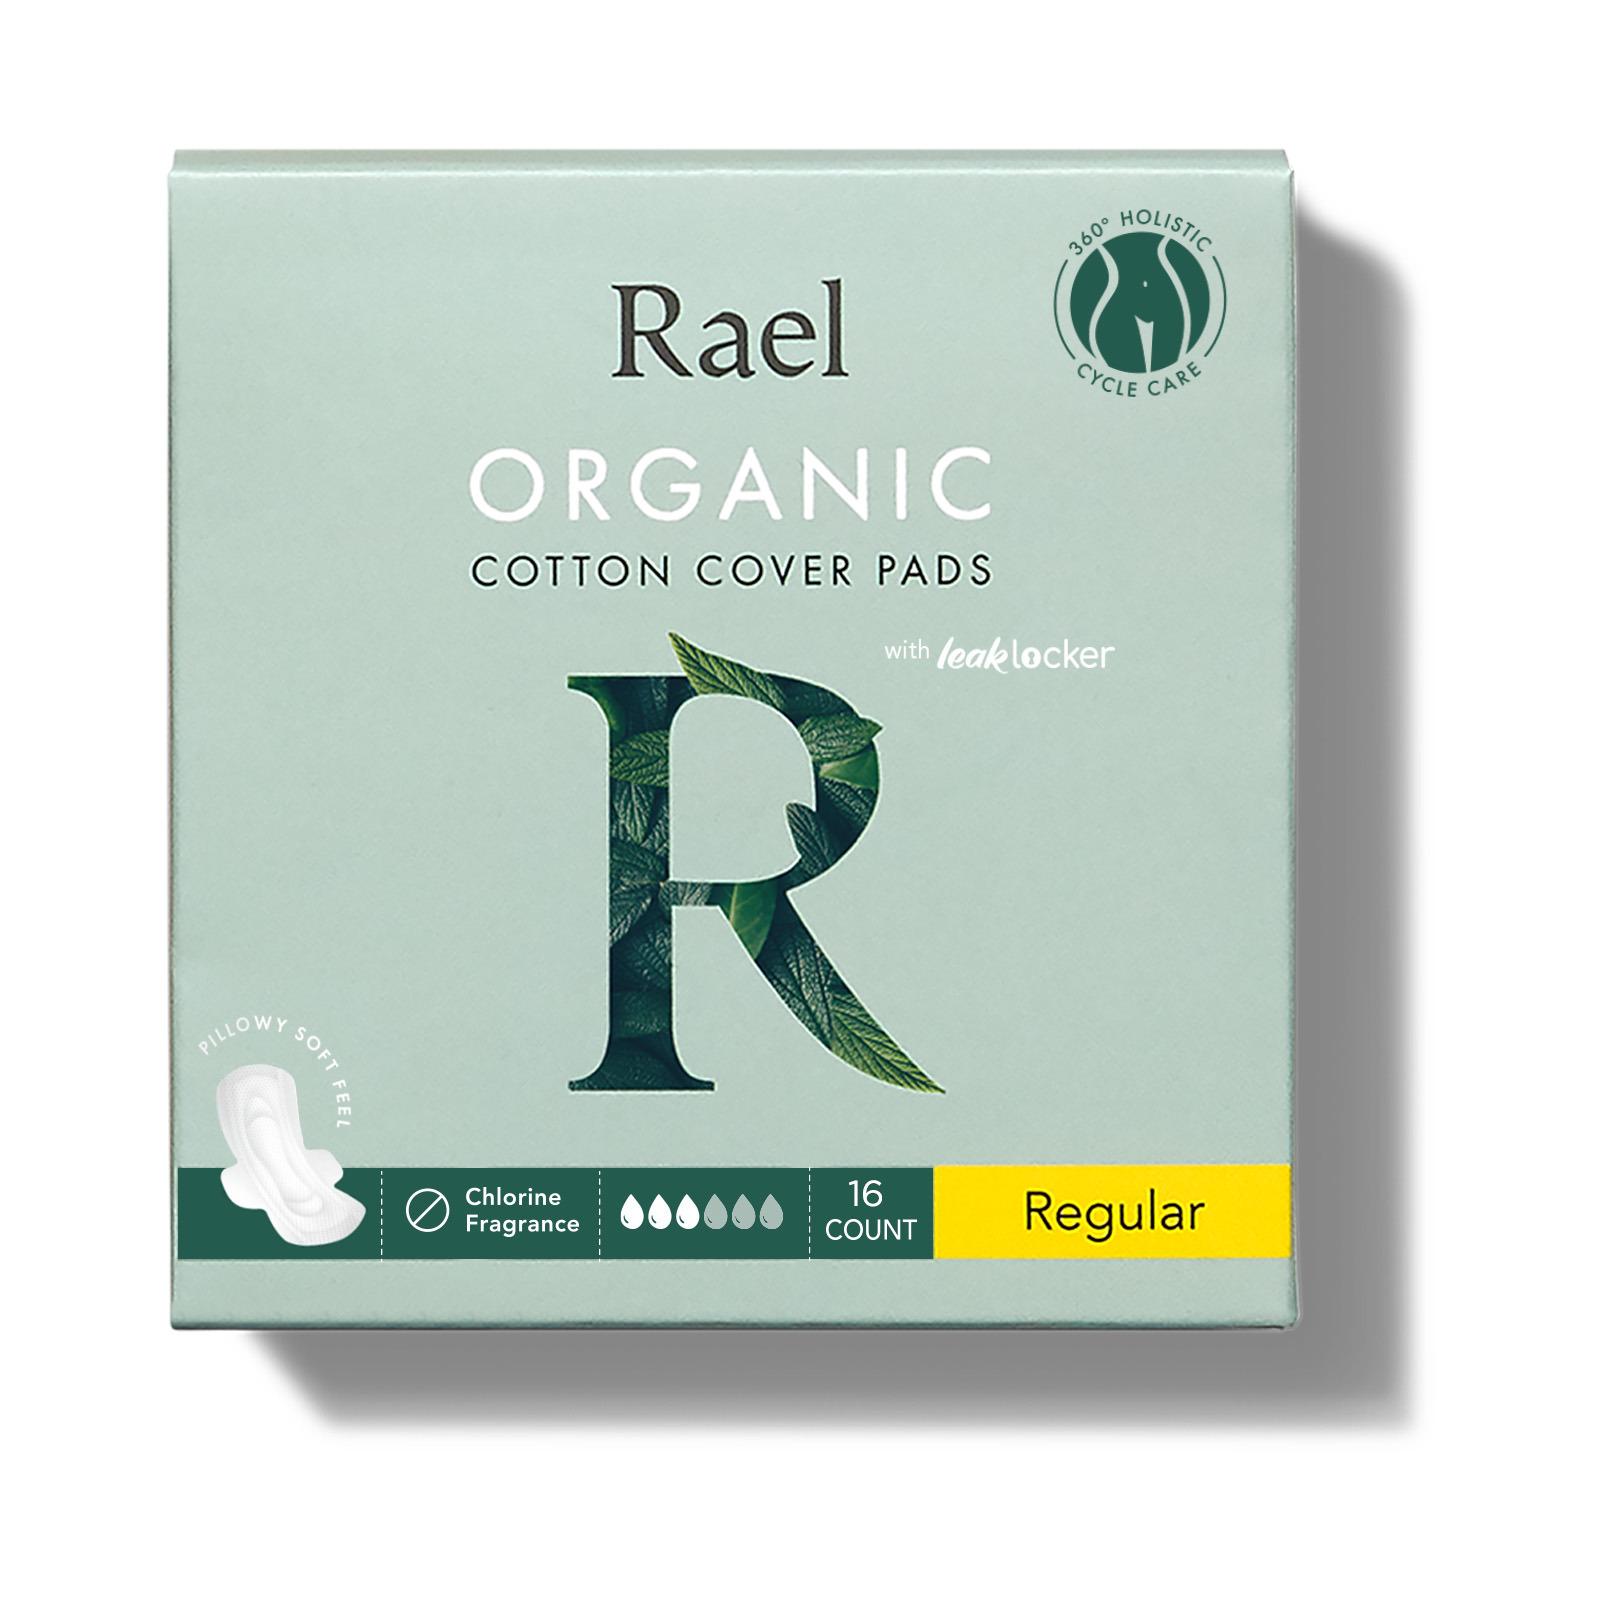 Rael Organic Cotton Cover Pads - Regular